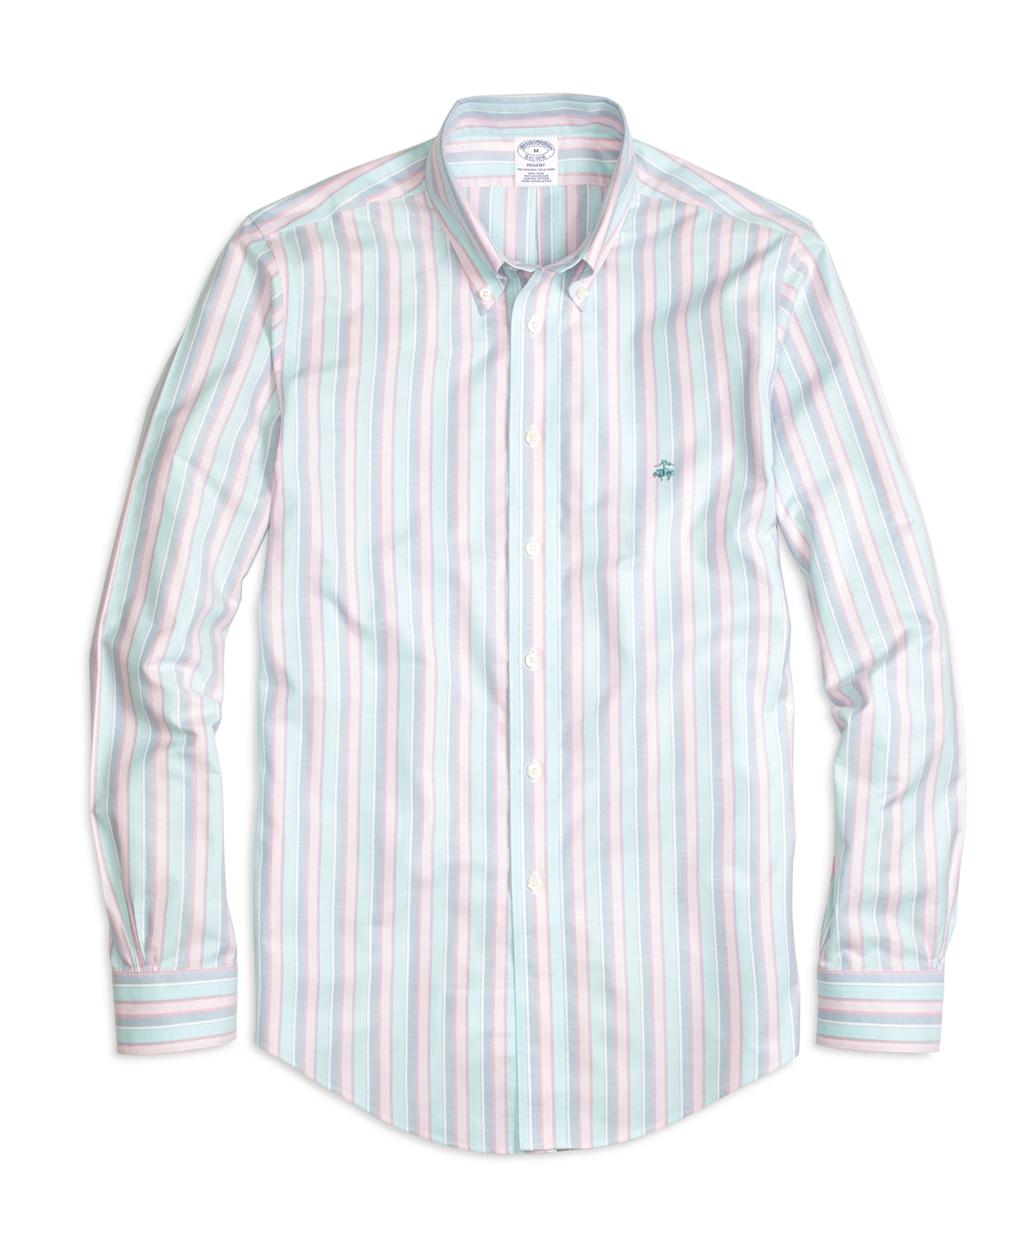 Brooks brothers madison fit oxford stripe sport shirt in for Brooks brothers sports shirts